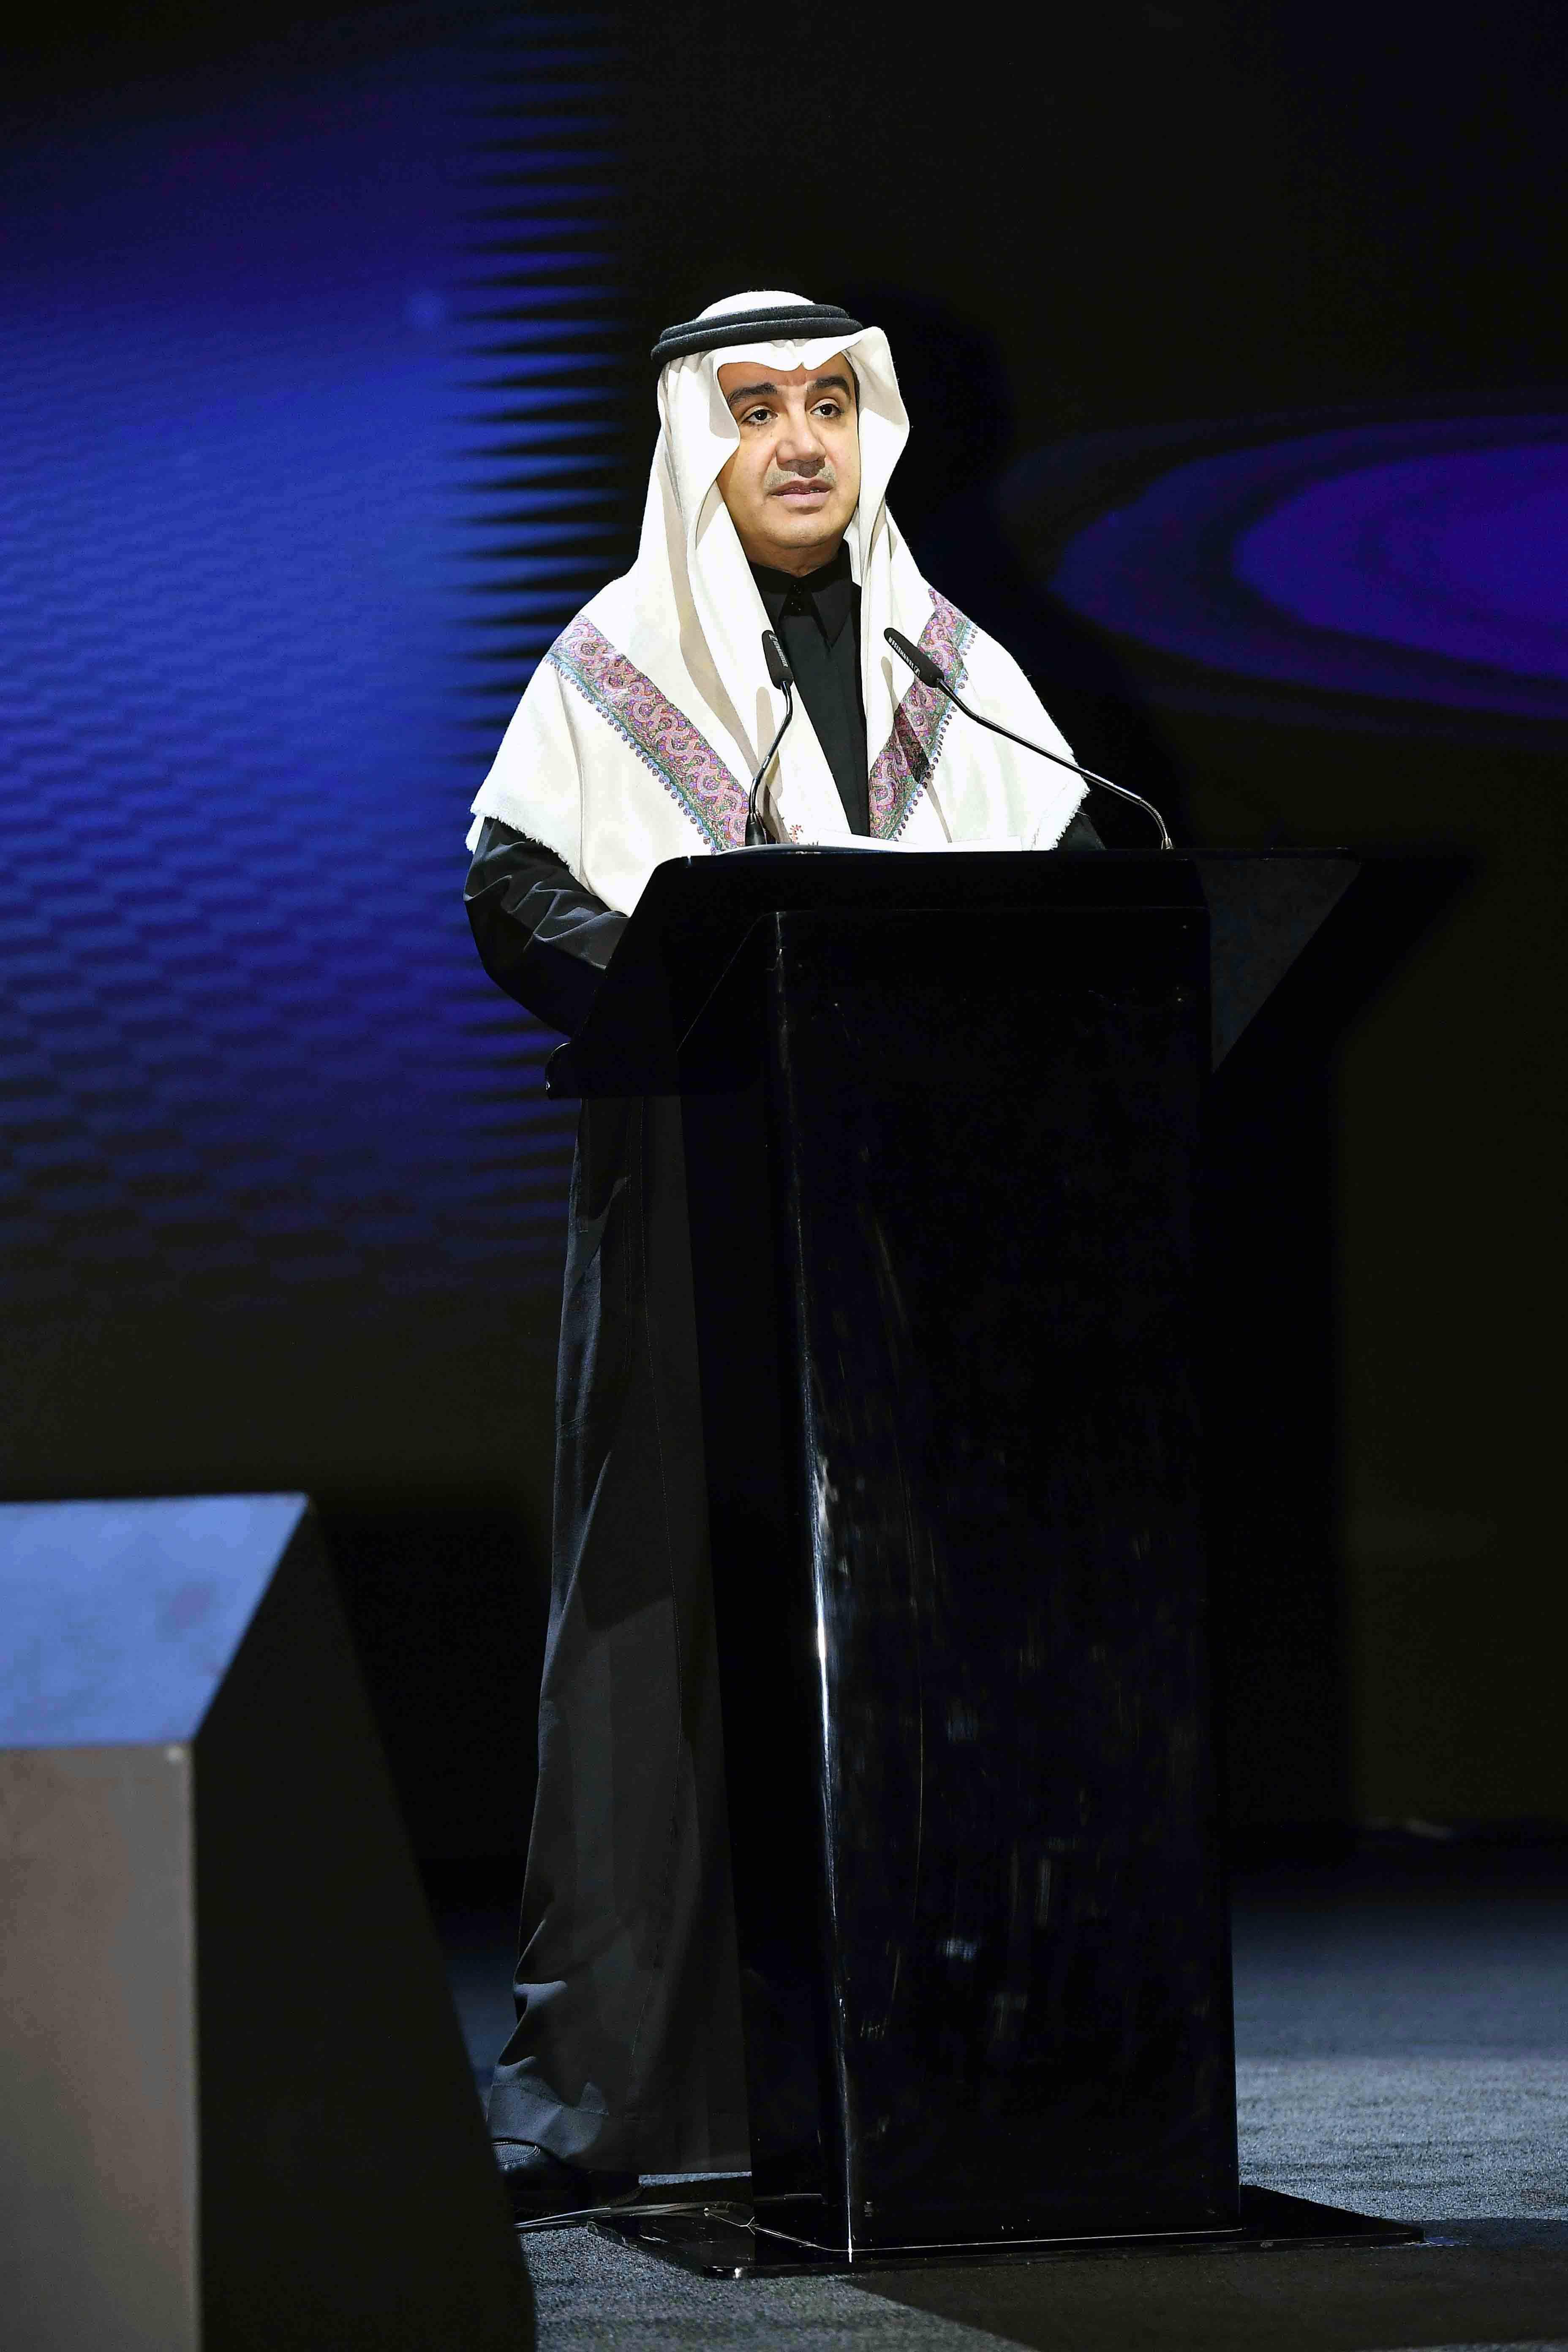 Shahid re-launch event - MBC Group Chairman, Sheikh Waleed Al Ibrahim (1)